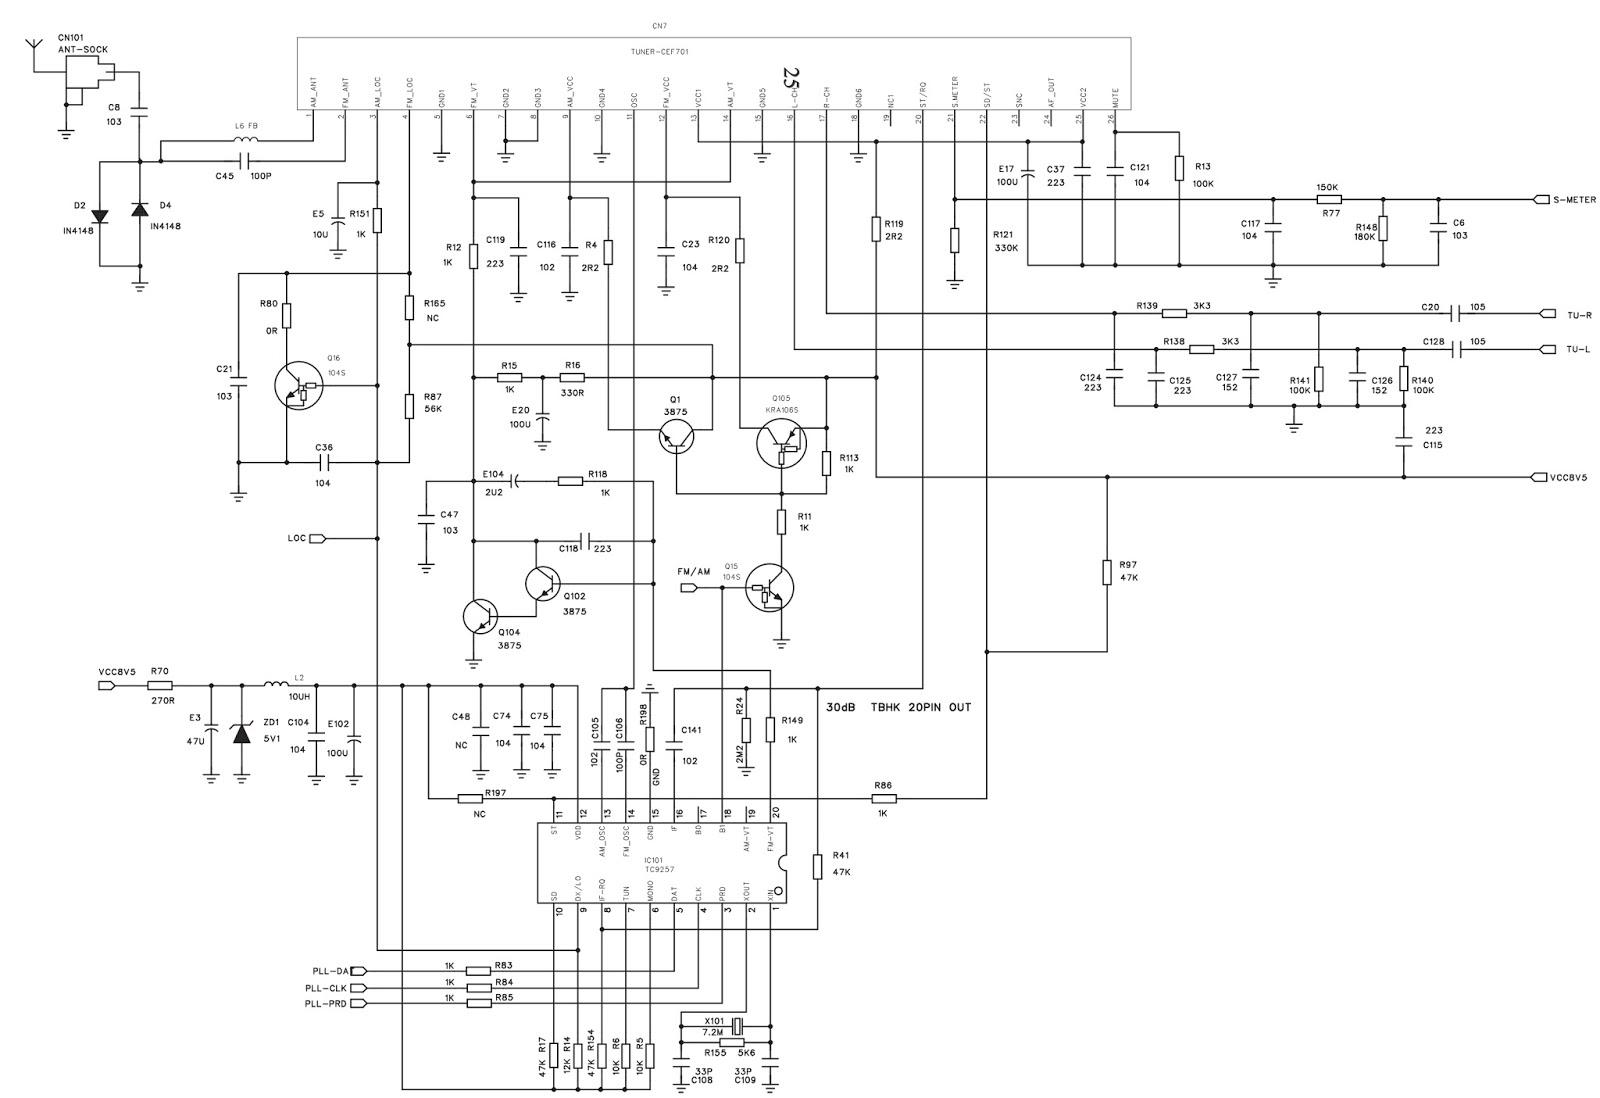 Exelent Bluebird Wiring Schematic Vignette - Electrical System Block ...